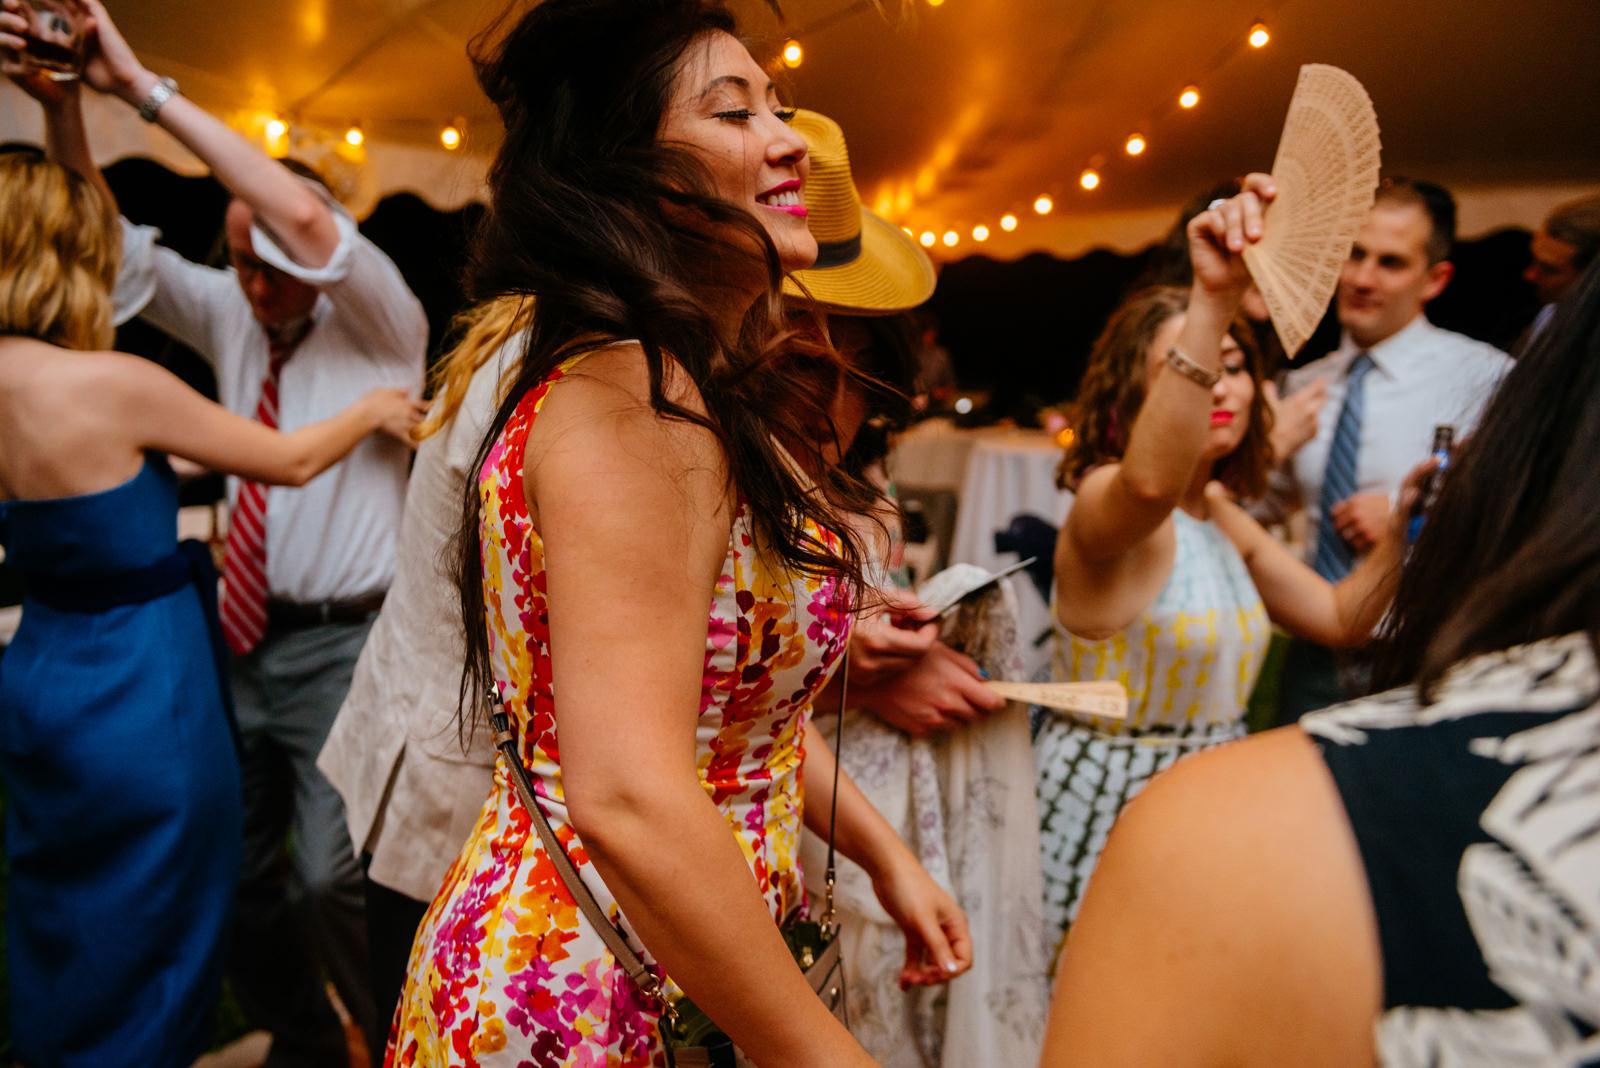 067b happy wedding guests dancing at reception